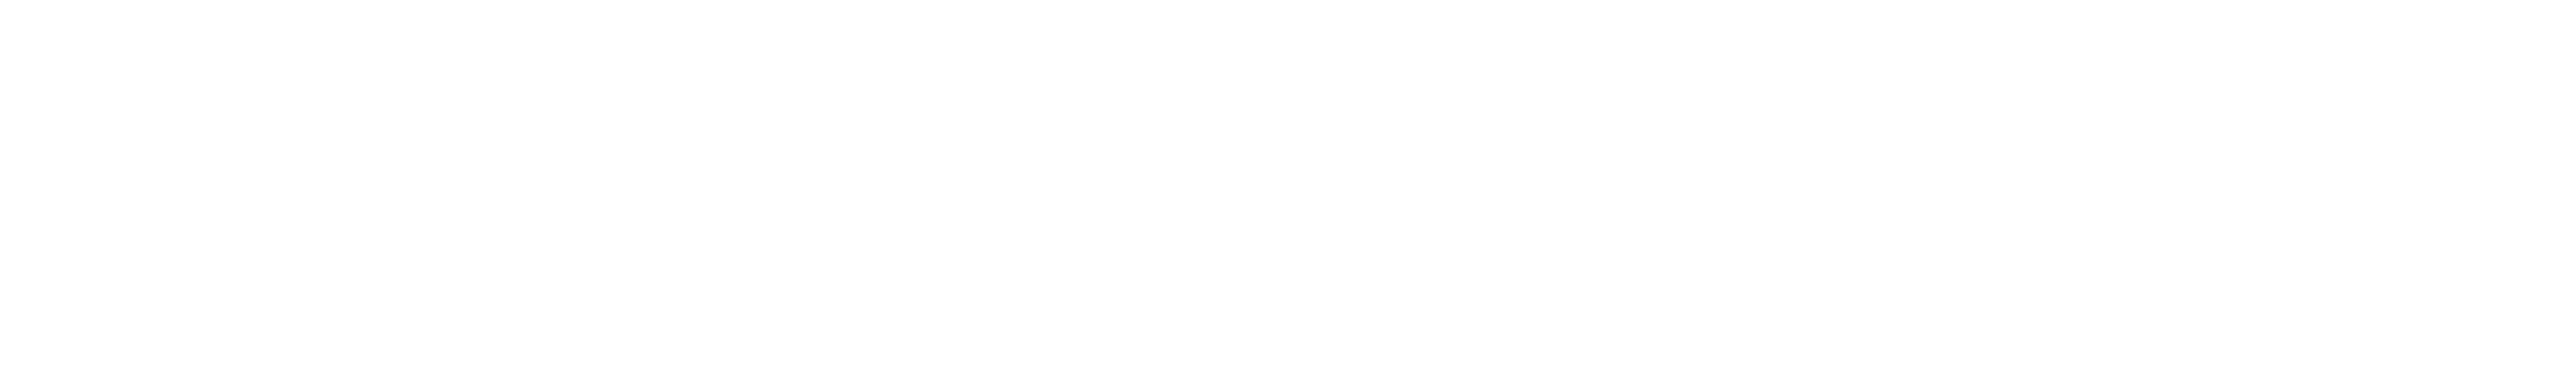 Neuroscience PhD Program - Berkeley Neuroscience